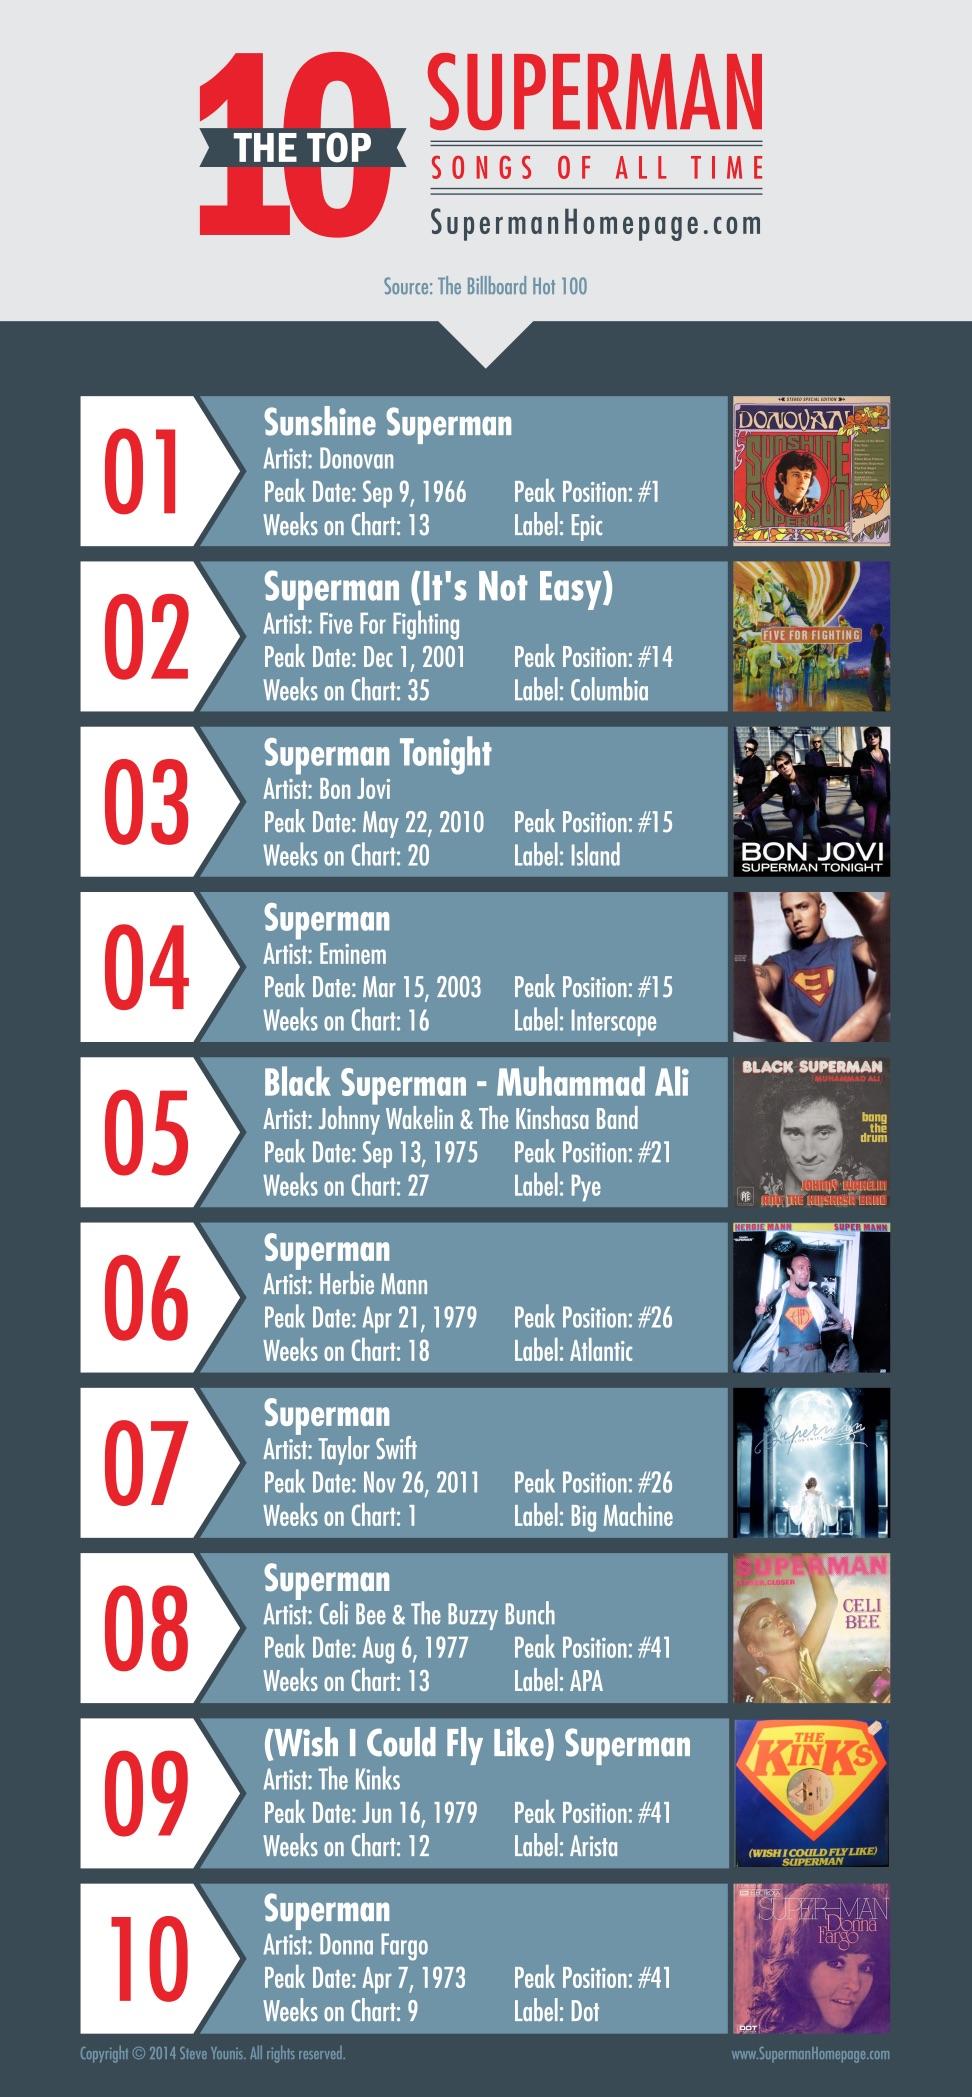 SupermanSongsTop10